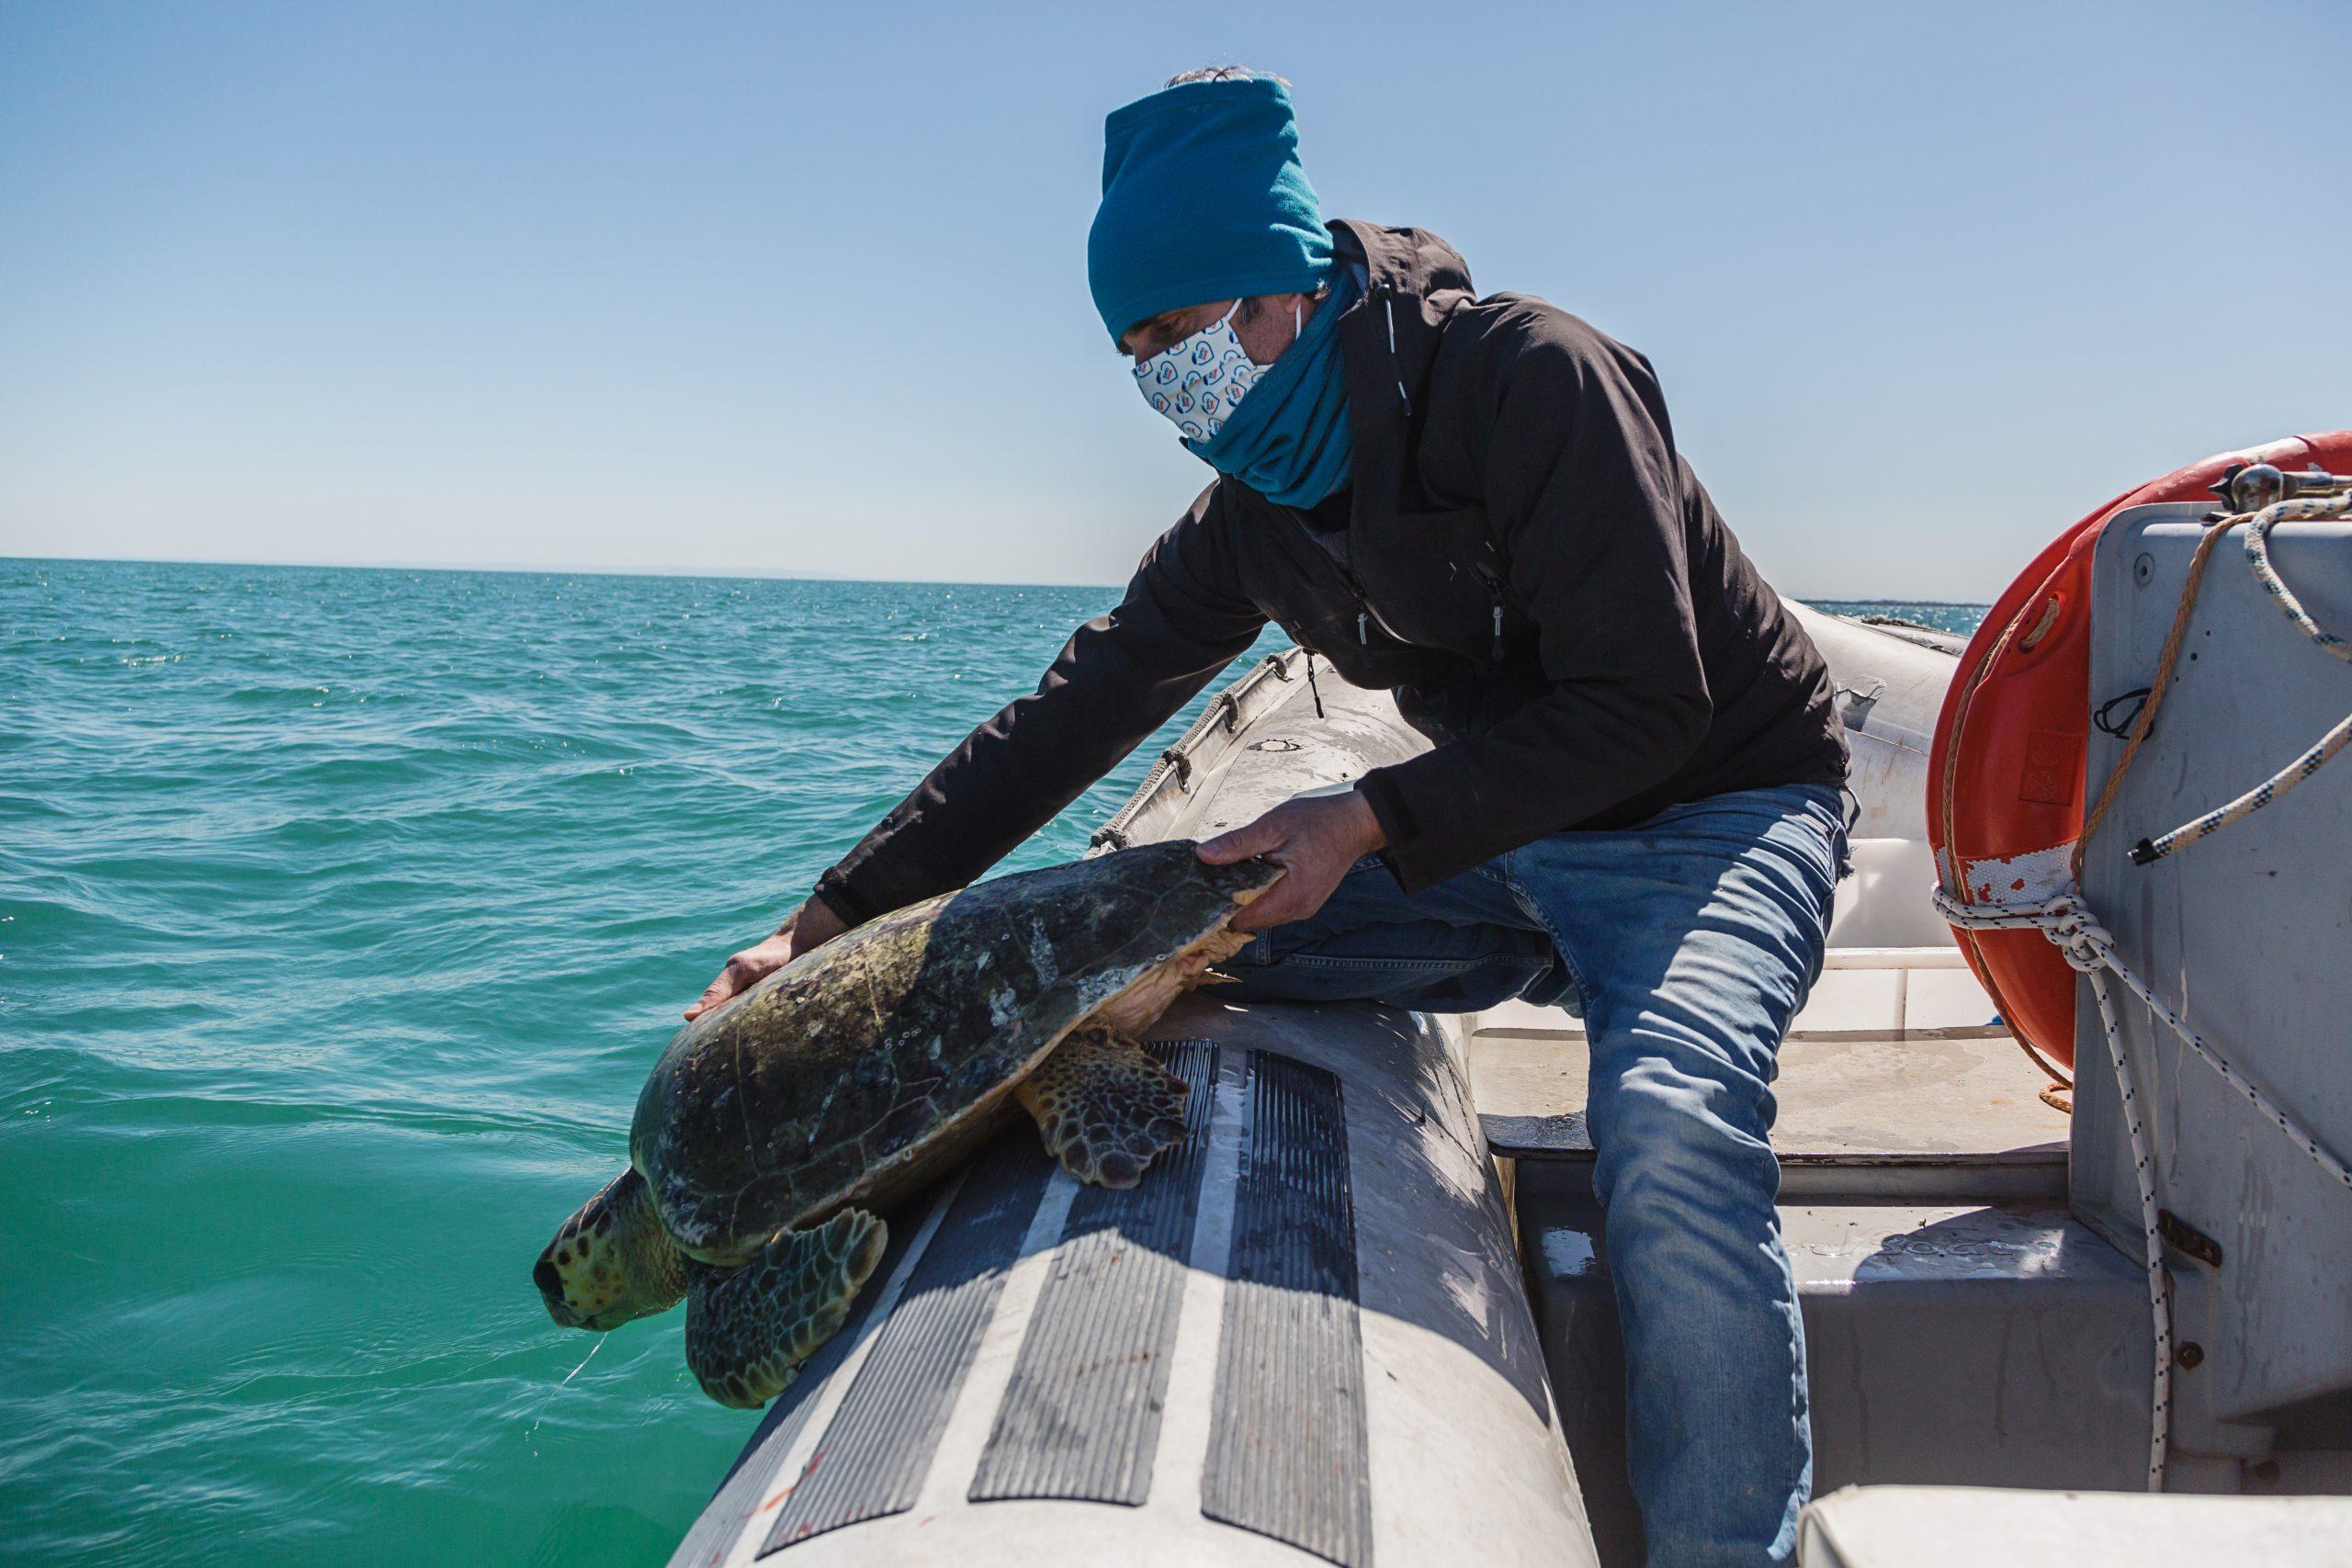 Manfredonia, Golfo - Giovanni Furii (Legambiente) libera in mare una tartaruga marina salvata da una cattura accidentale.